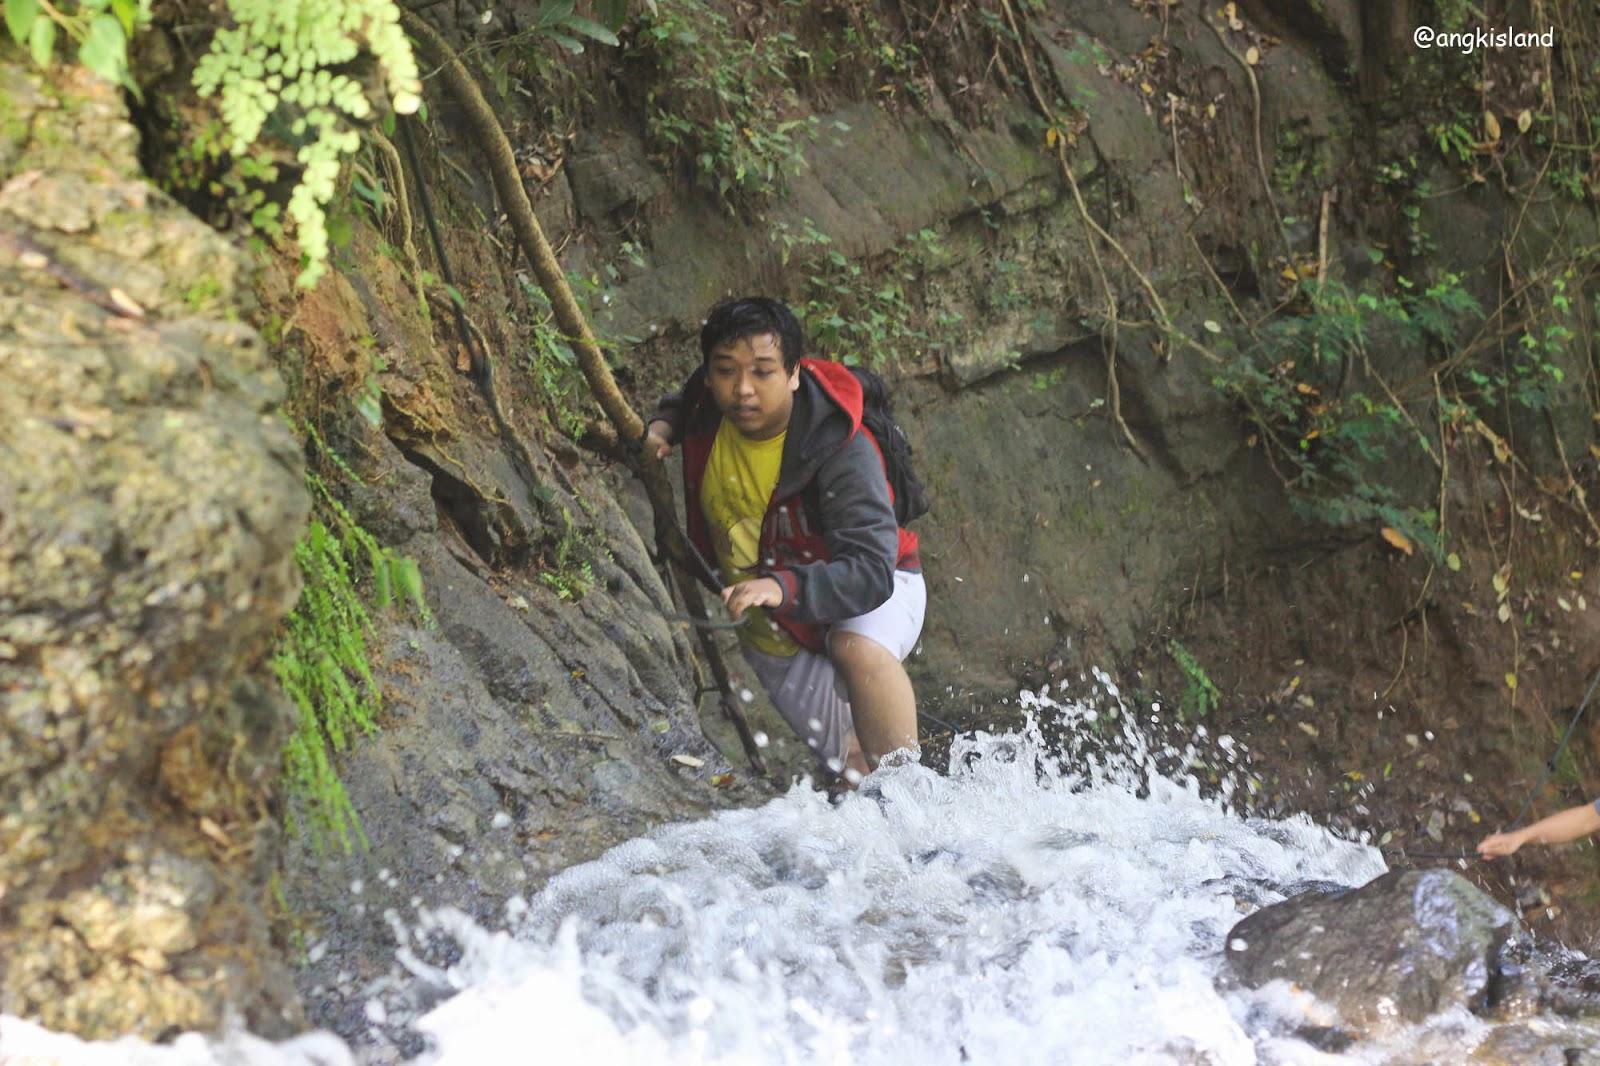 Air Terjun Njuruk gedhe Gunungkidul yogyakarta